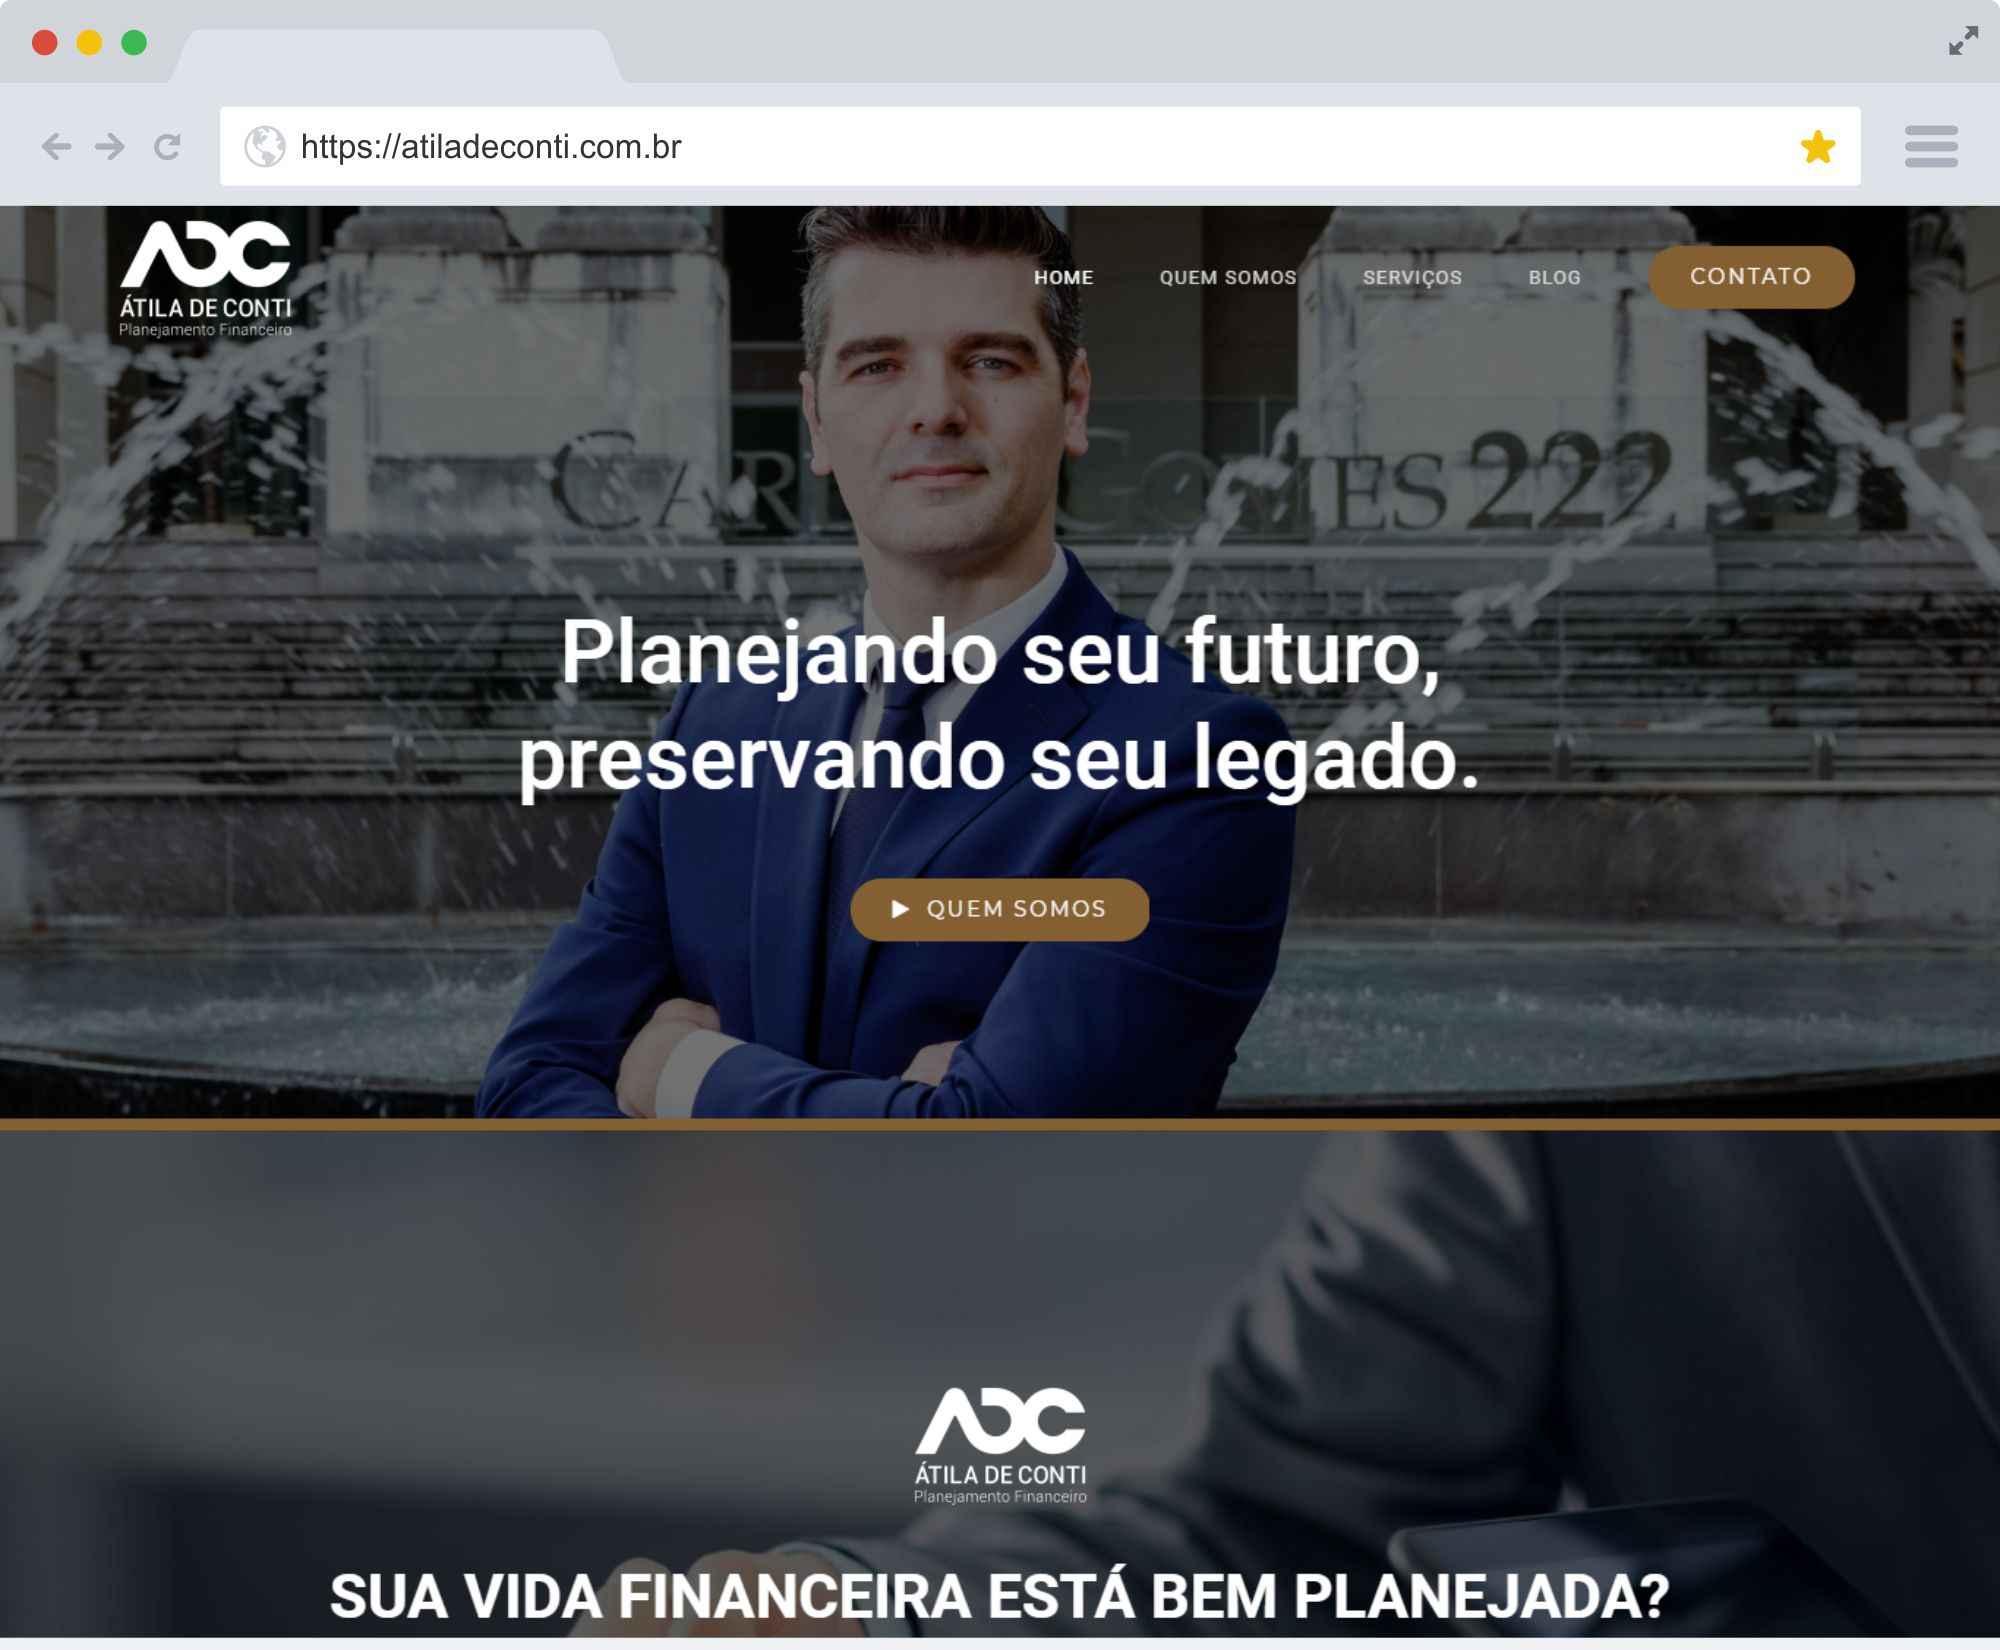 atiladeconti.com.br